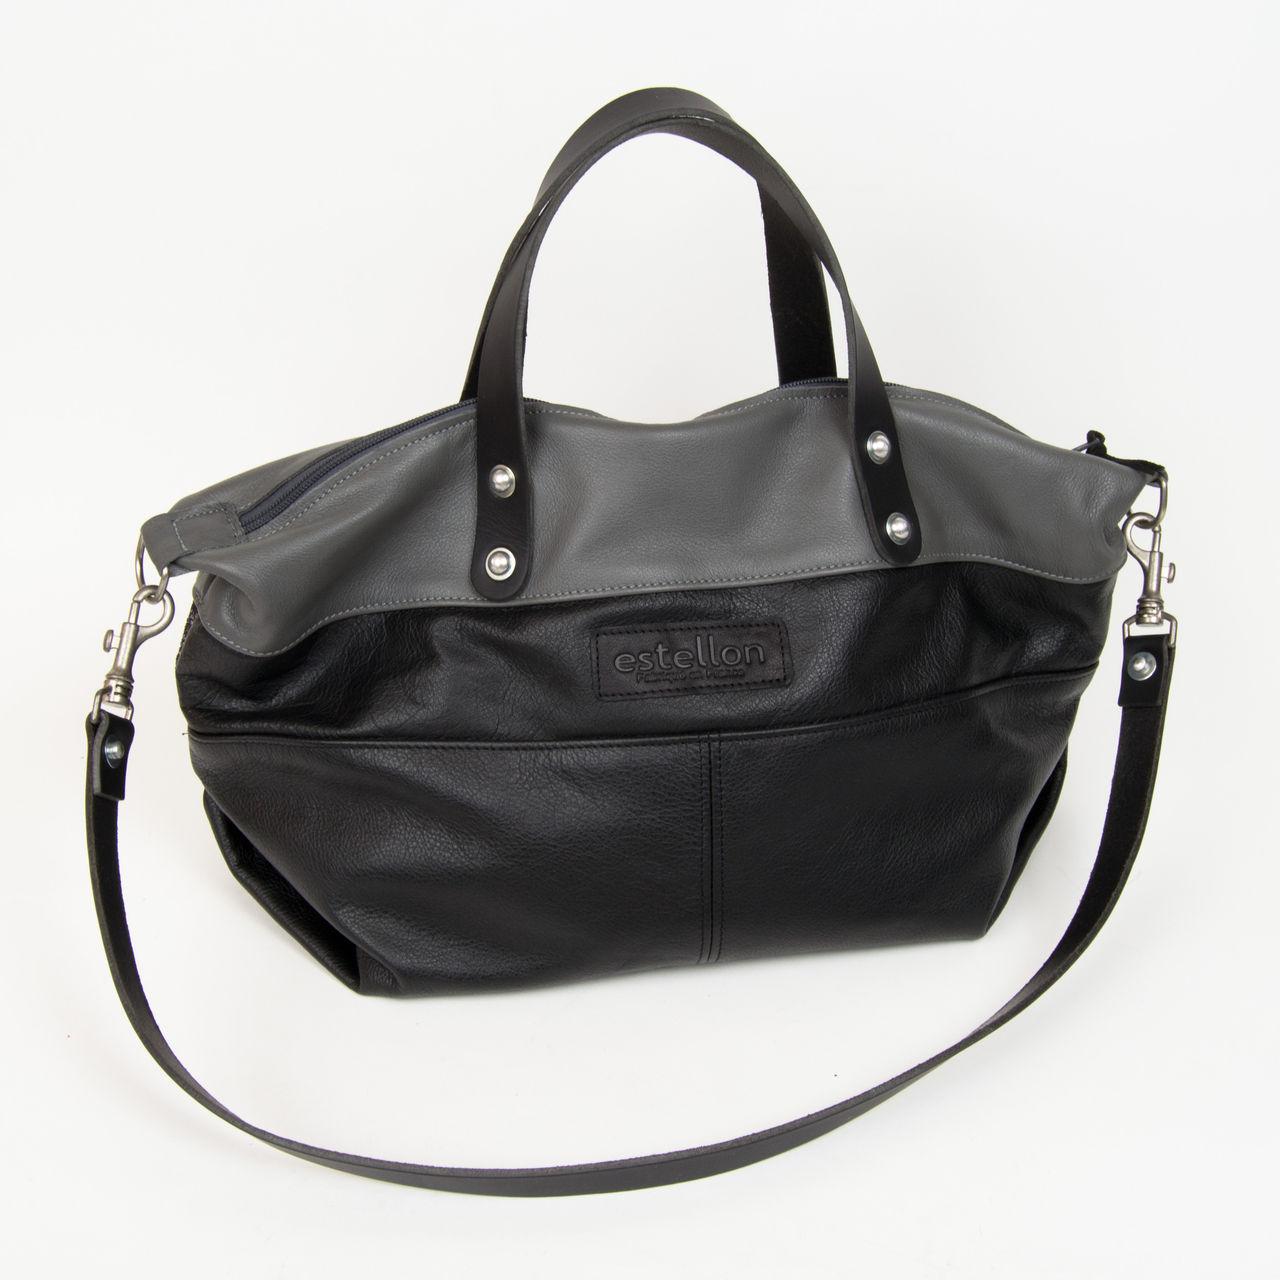 la femme sacs estellon sac estellon lucky night noir. Black Bedroom Furniture Sets. Home Design Ideas